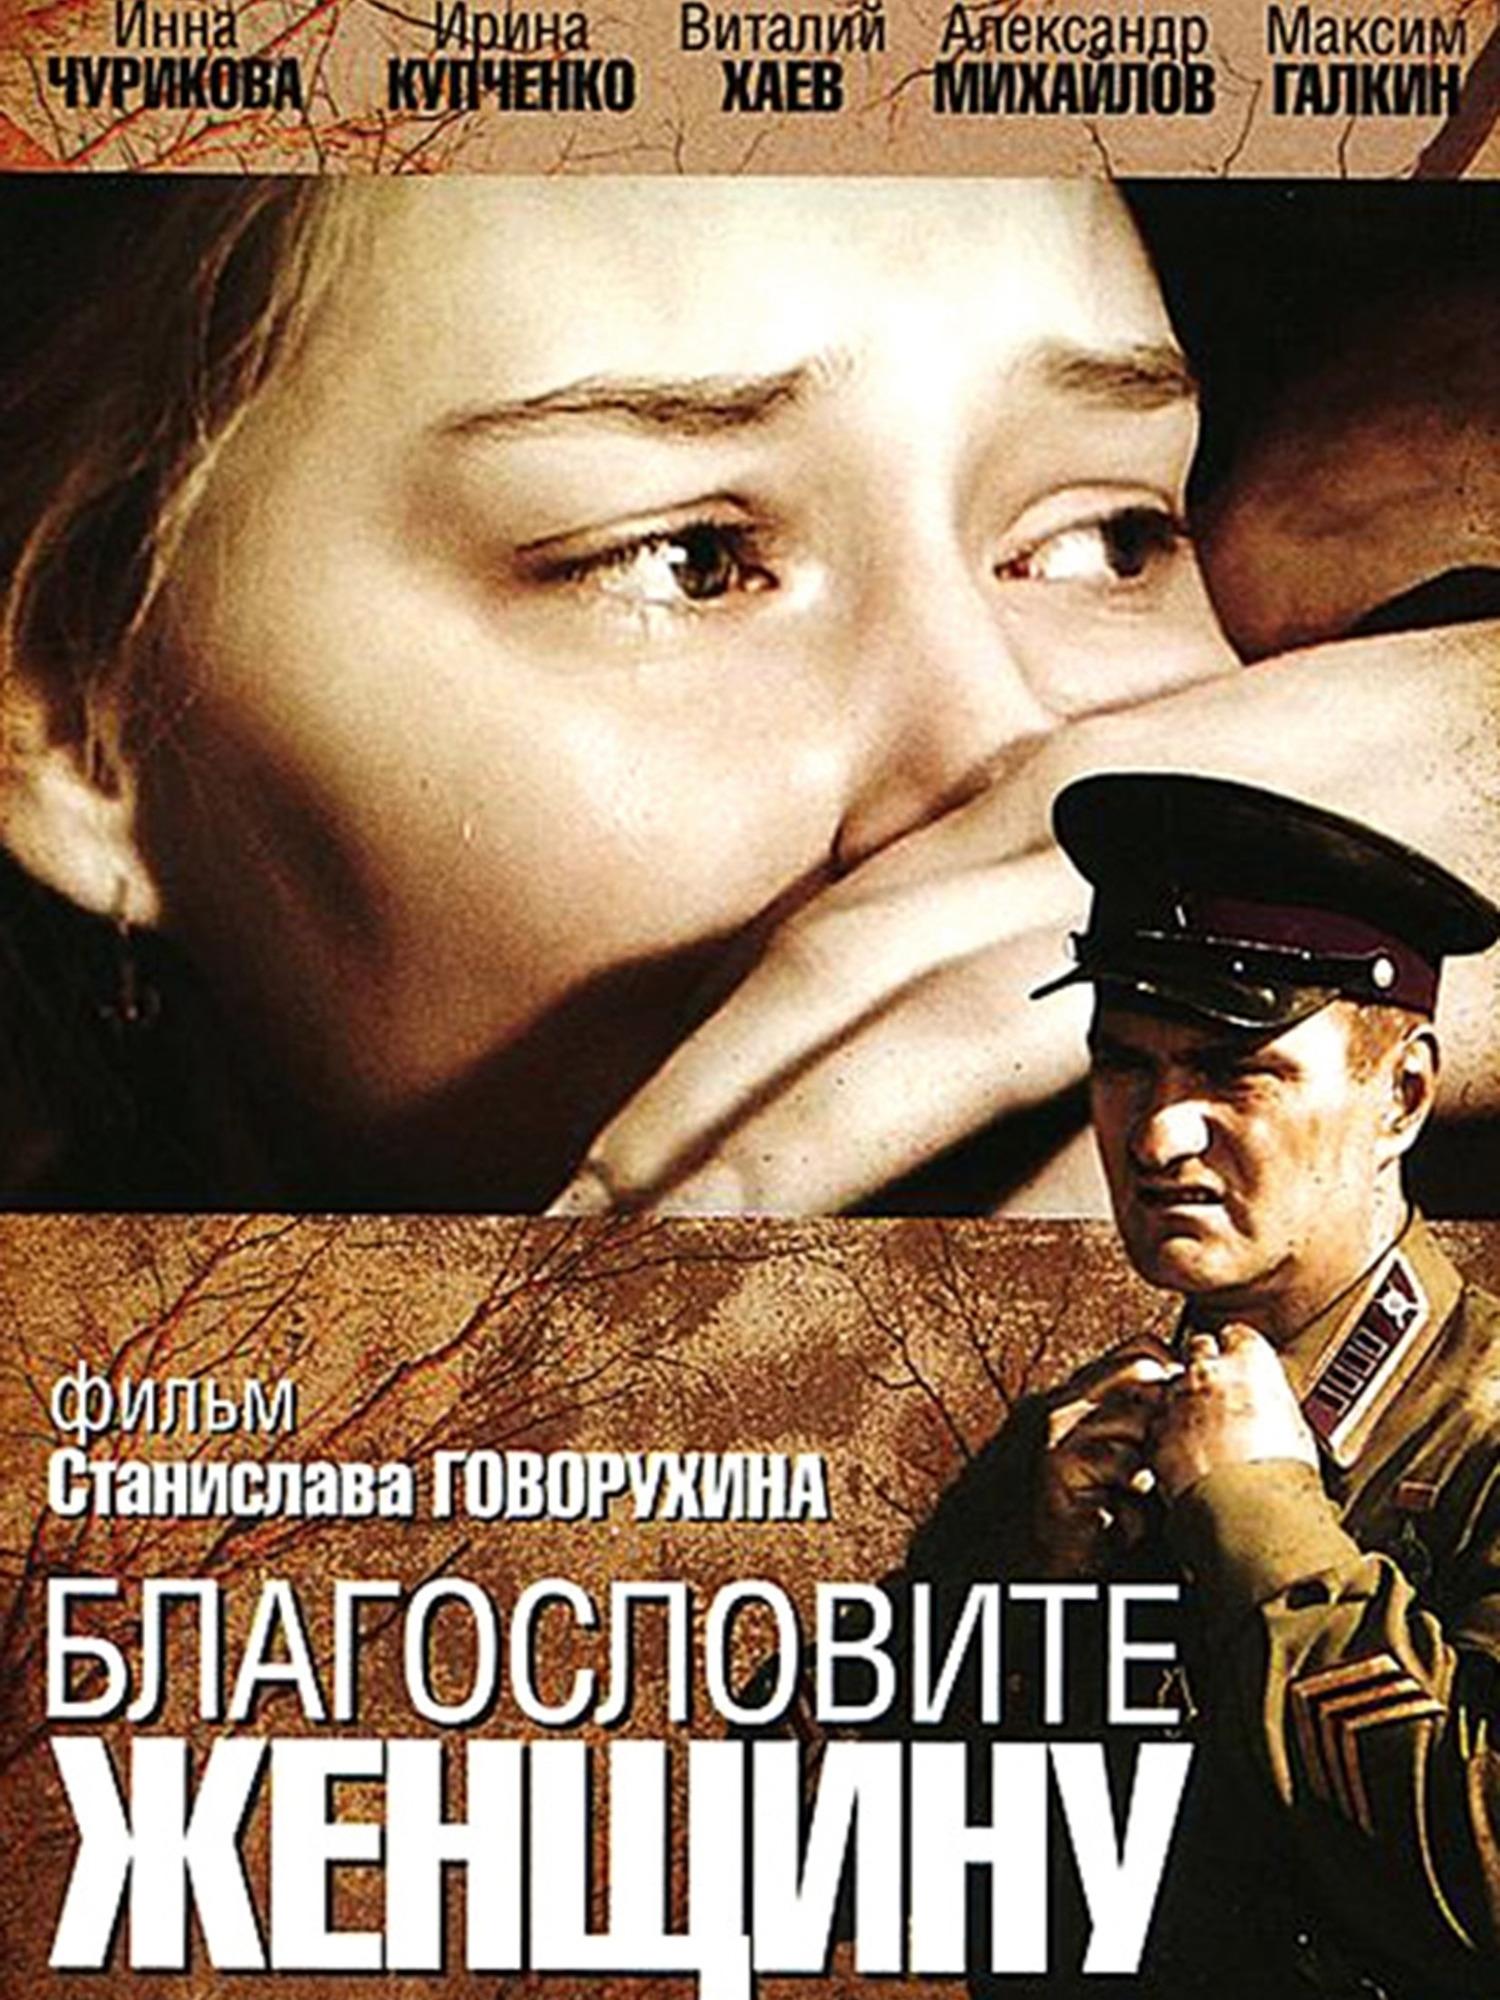 Gott segne die Frau (Russian Audio)